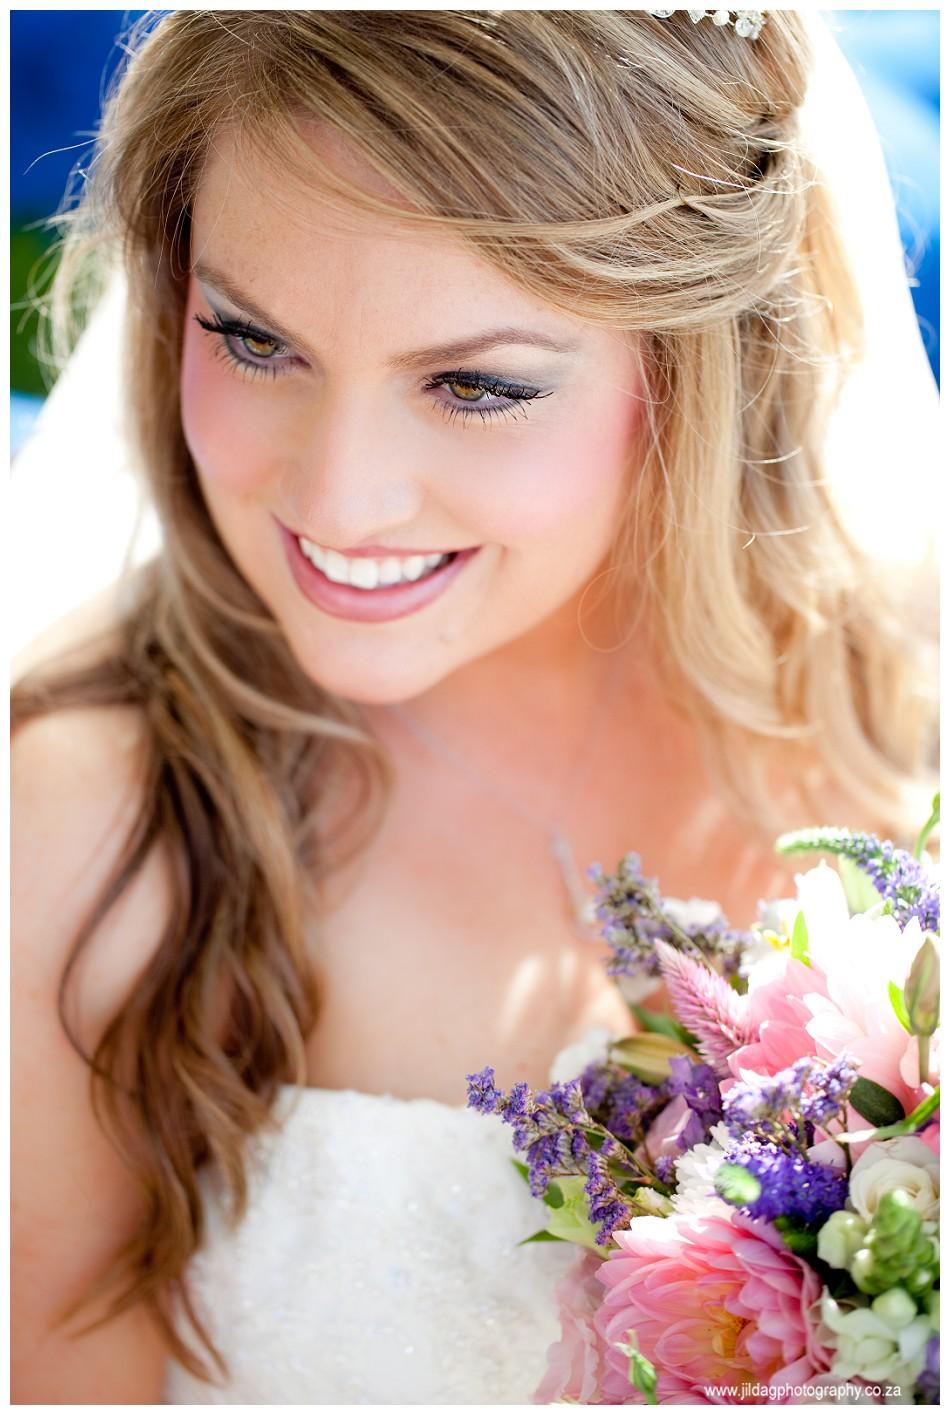 Blaauklippen - Stellenbosch wedding - Jilda G Photography (22)